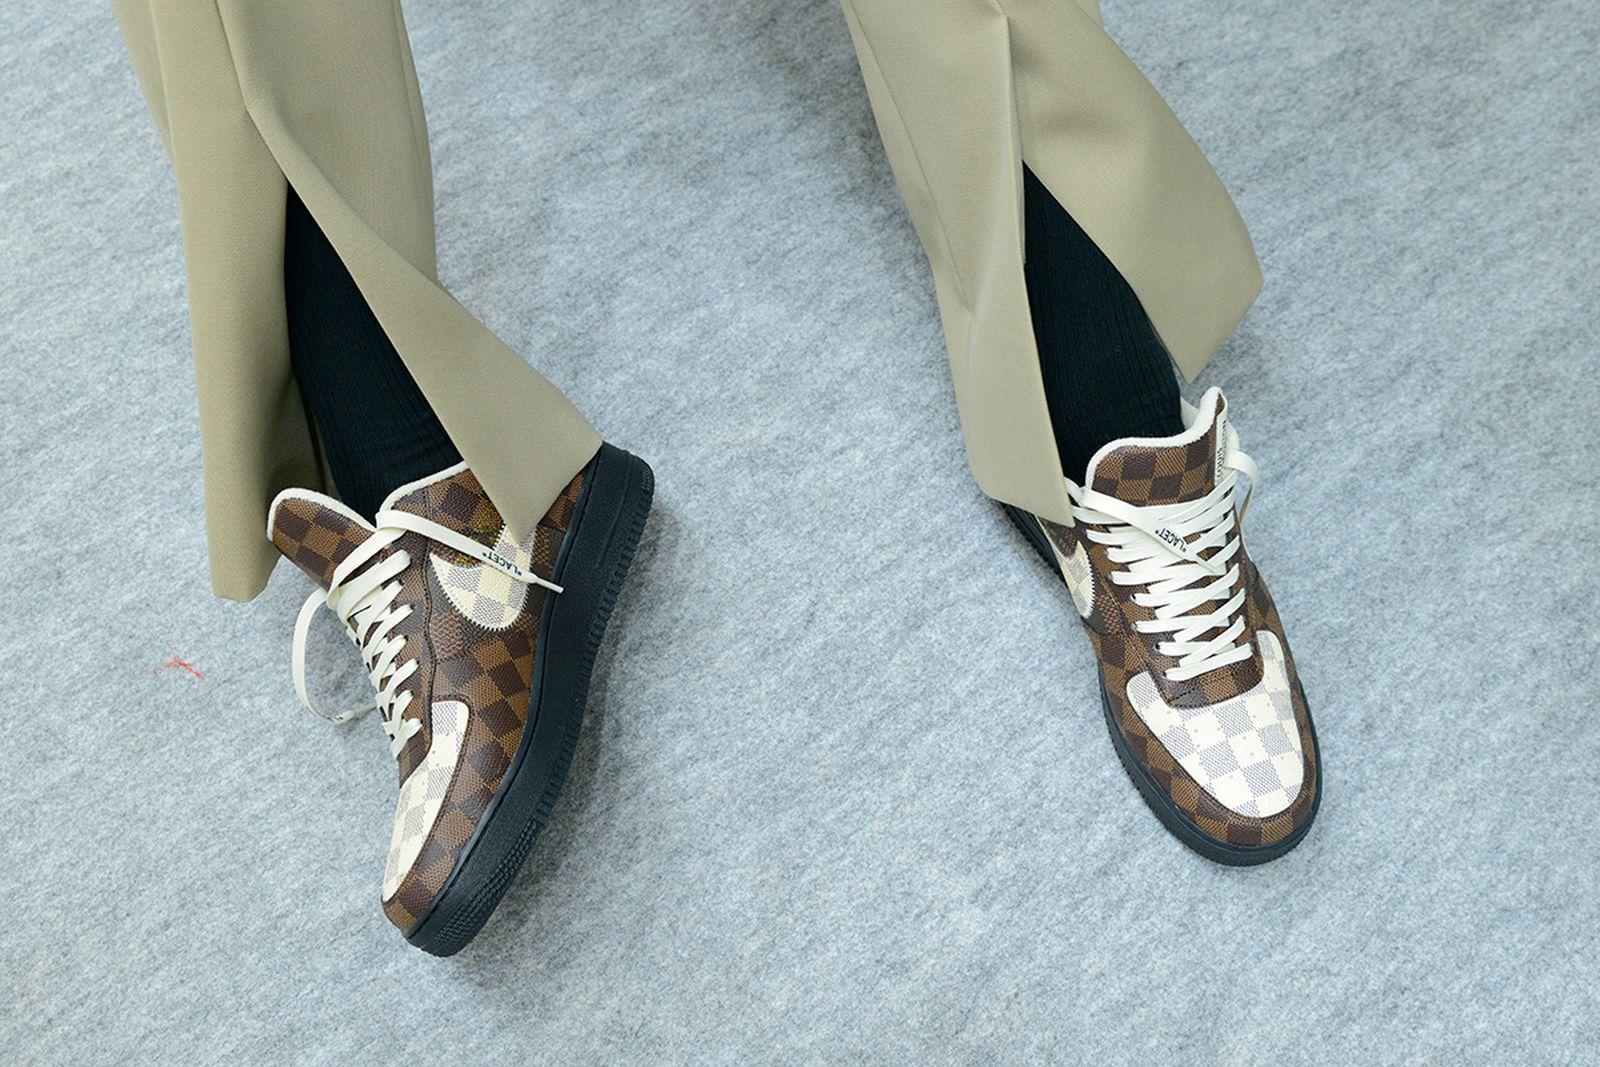 louis-vuitton-nike-virgil-abloh-sneaker-reveal-05